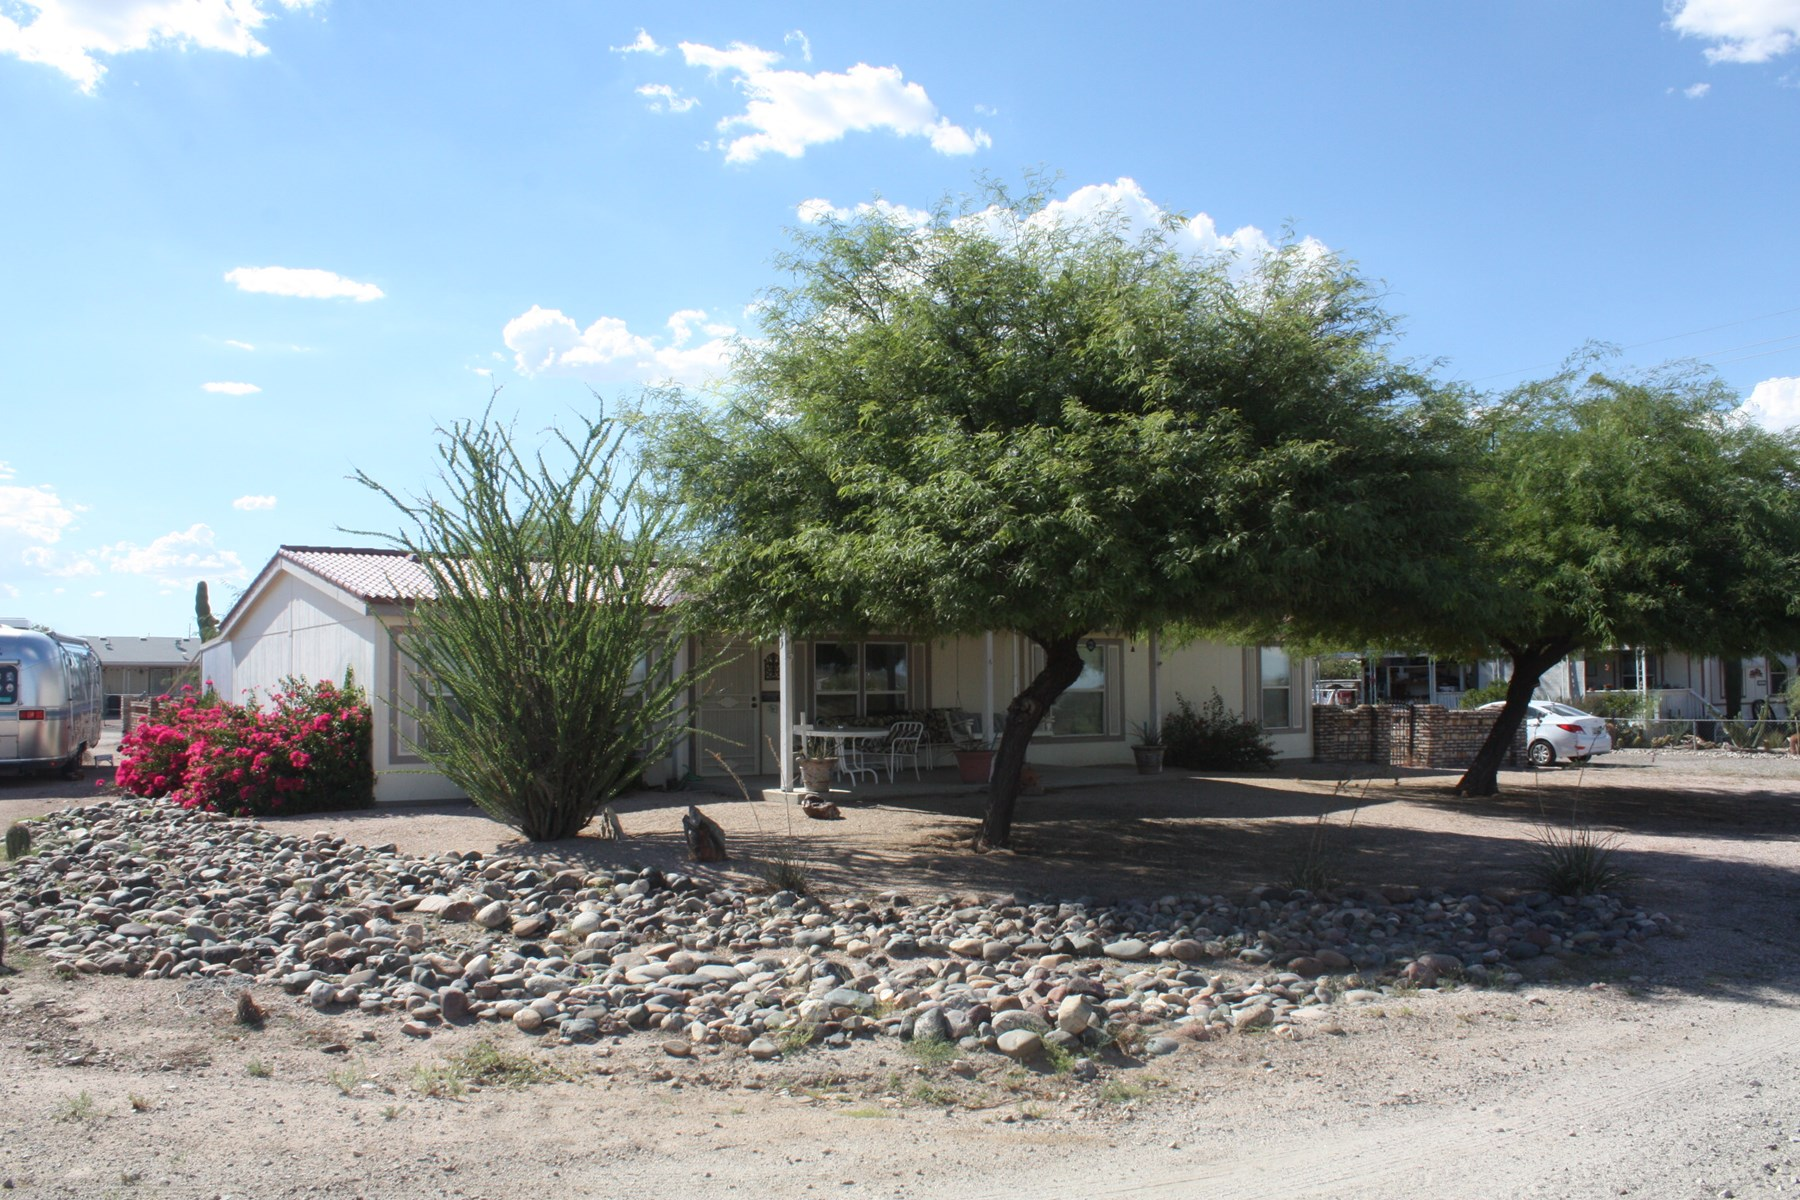 Three bedroom home Salome,AZ RV Hook-ups Garage and Storage